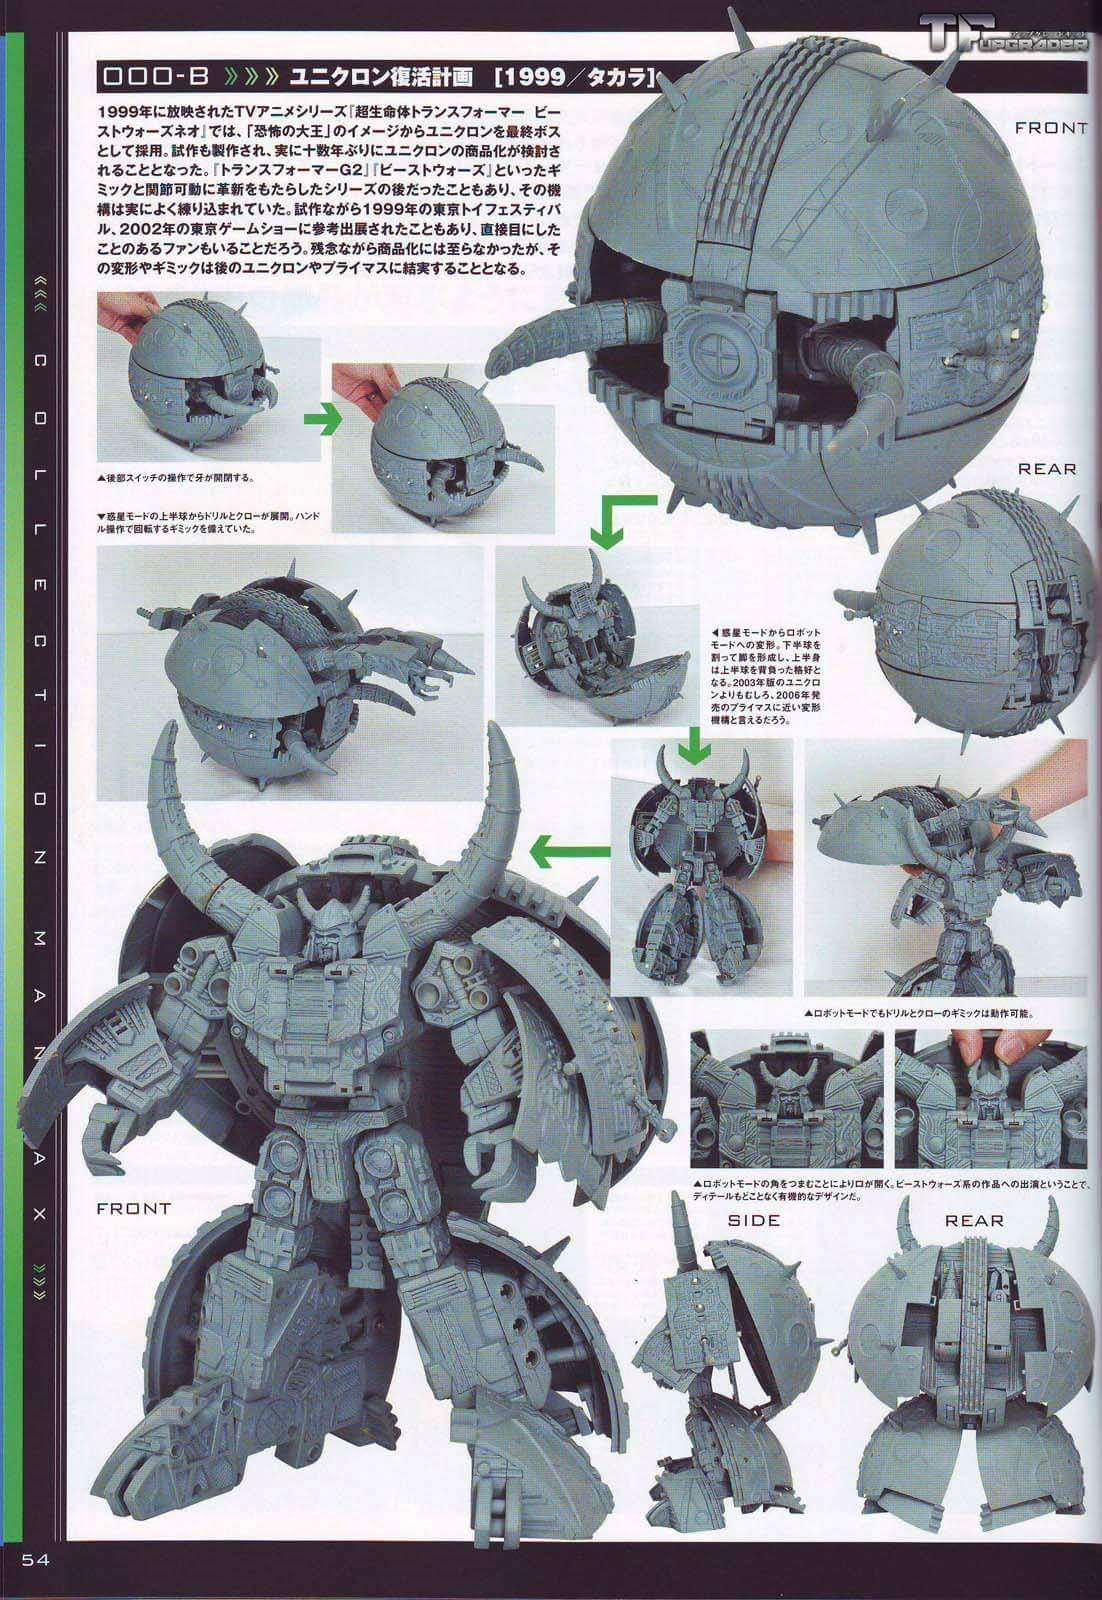 [Garatron] Produit Tiers - Gangs Of Devils G.O.D-02 Galaxy Demolishor - aka Unicron (Beast Wars Neo) OE7SHVRJ